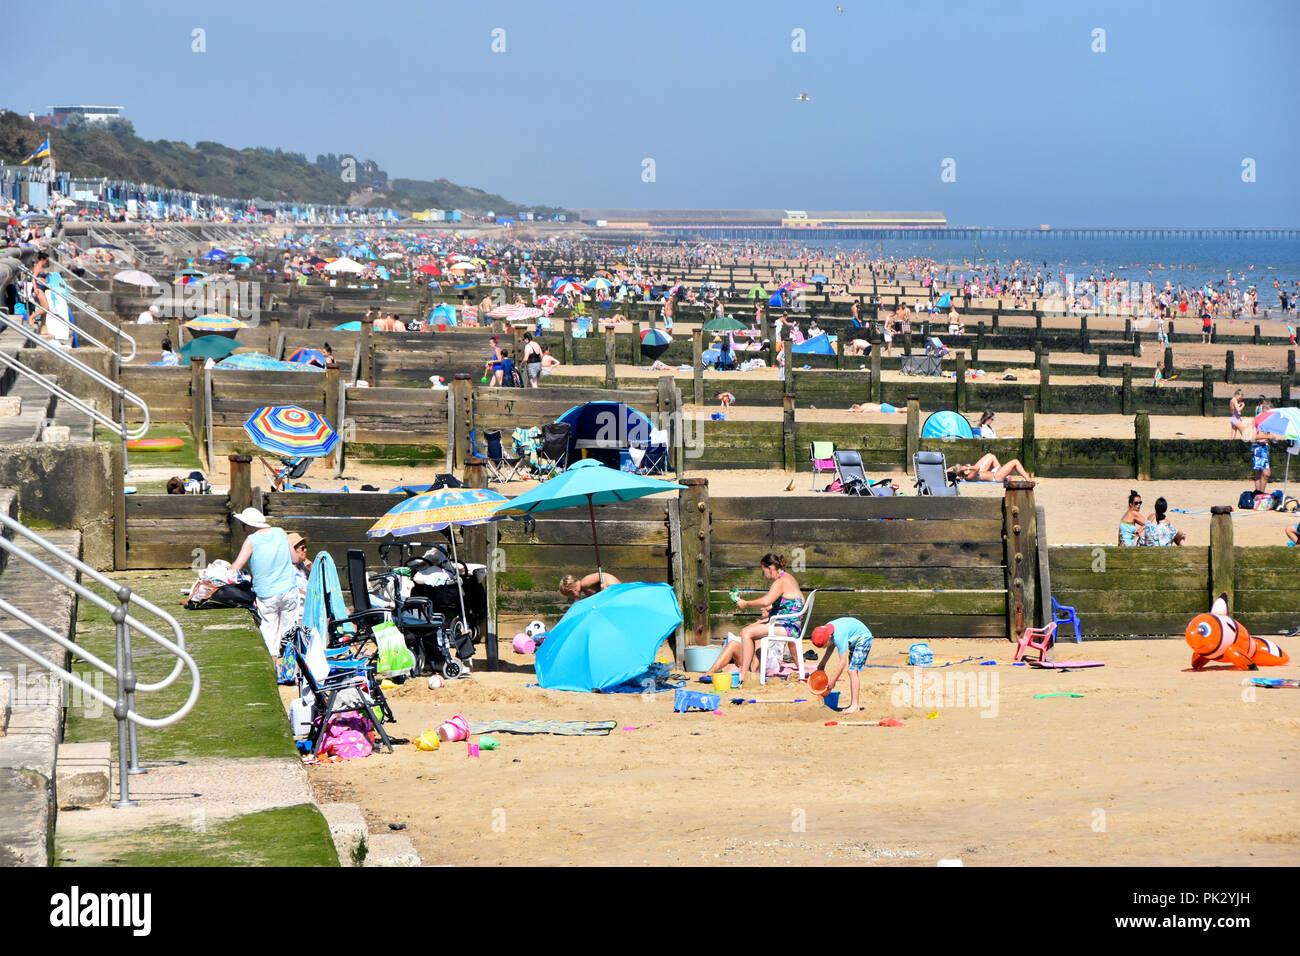 2018 hot weather summer crowds of holiday people on Essex seaside sand coast family beach for safe play & sunbathing Frinton on Sea resort England UK Stock Photo